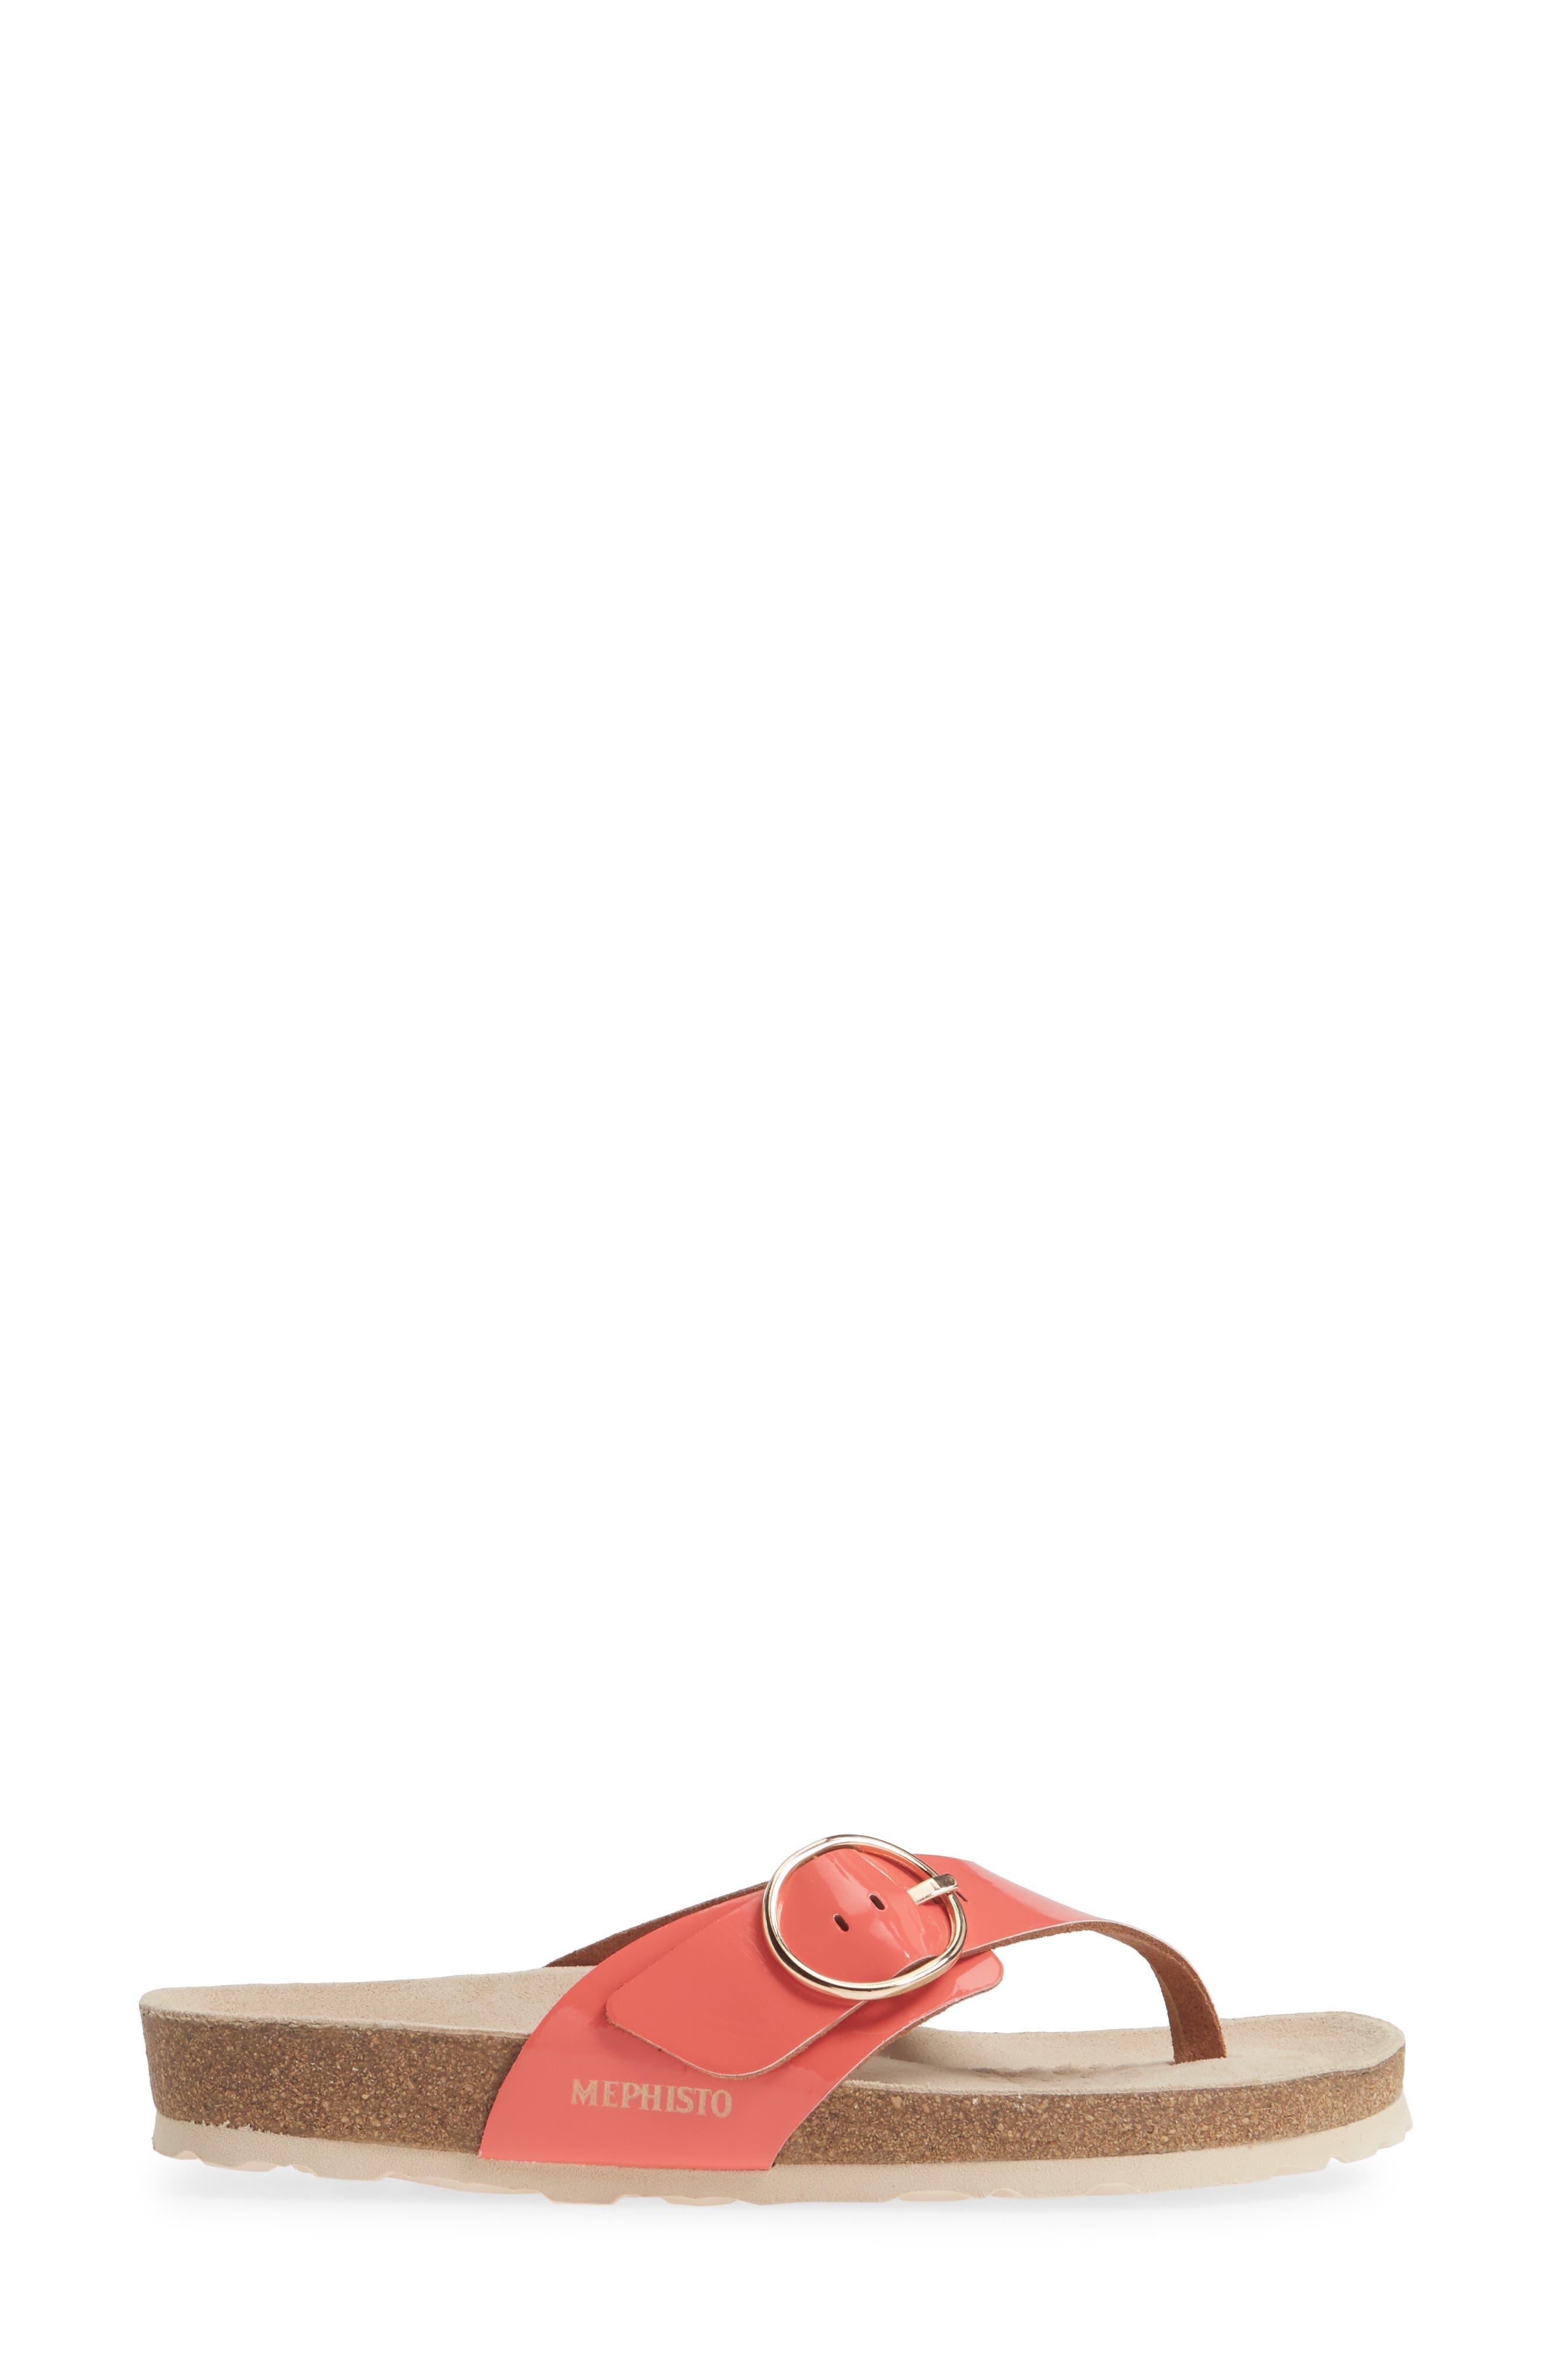 MEPHISTO, Natalina Slide Flip Flop, Alternate thumbnail 3, color, CORAL PATENT LEATHER